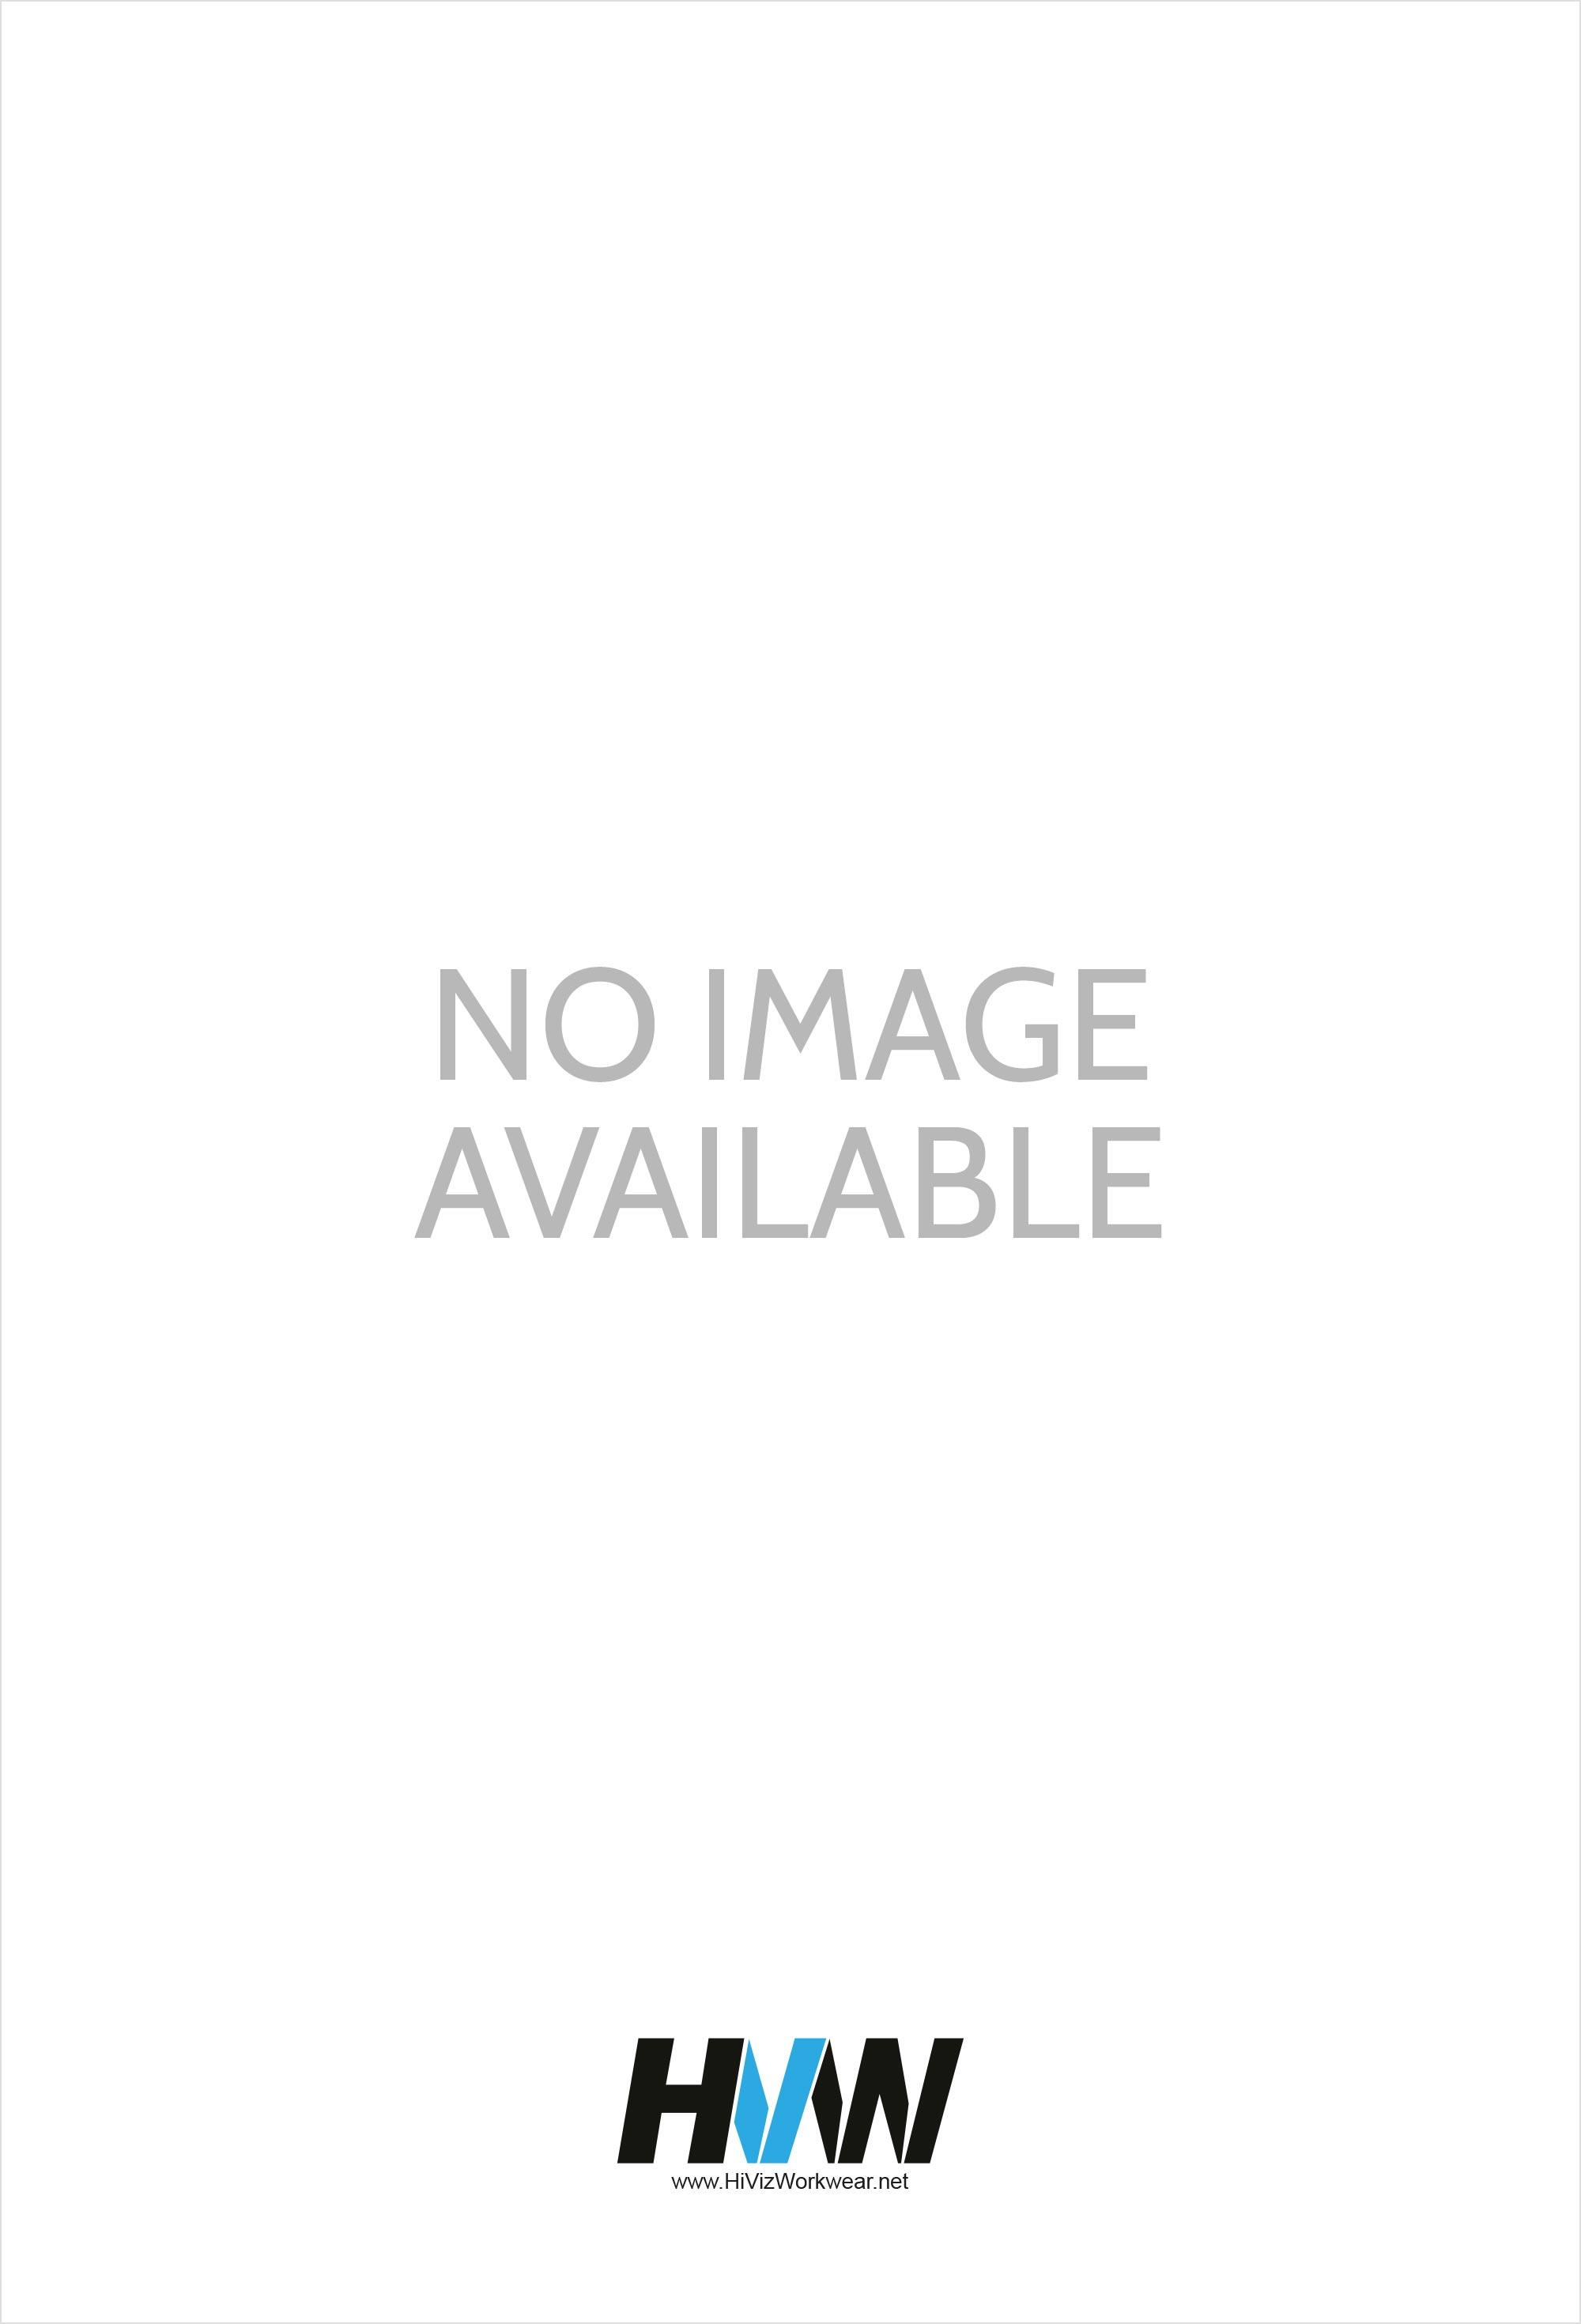 KK104 Long Sleeved Business Shirt  (Collar Size  14.5 To 19.5)